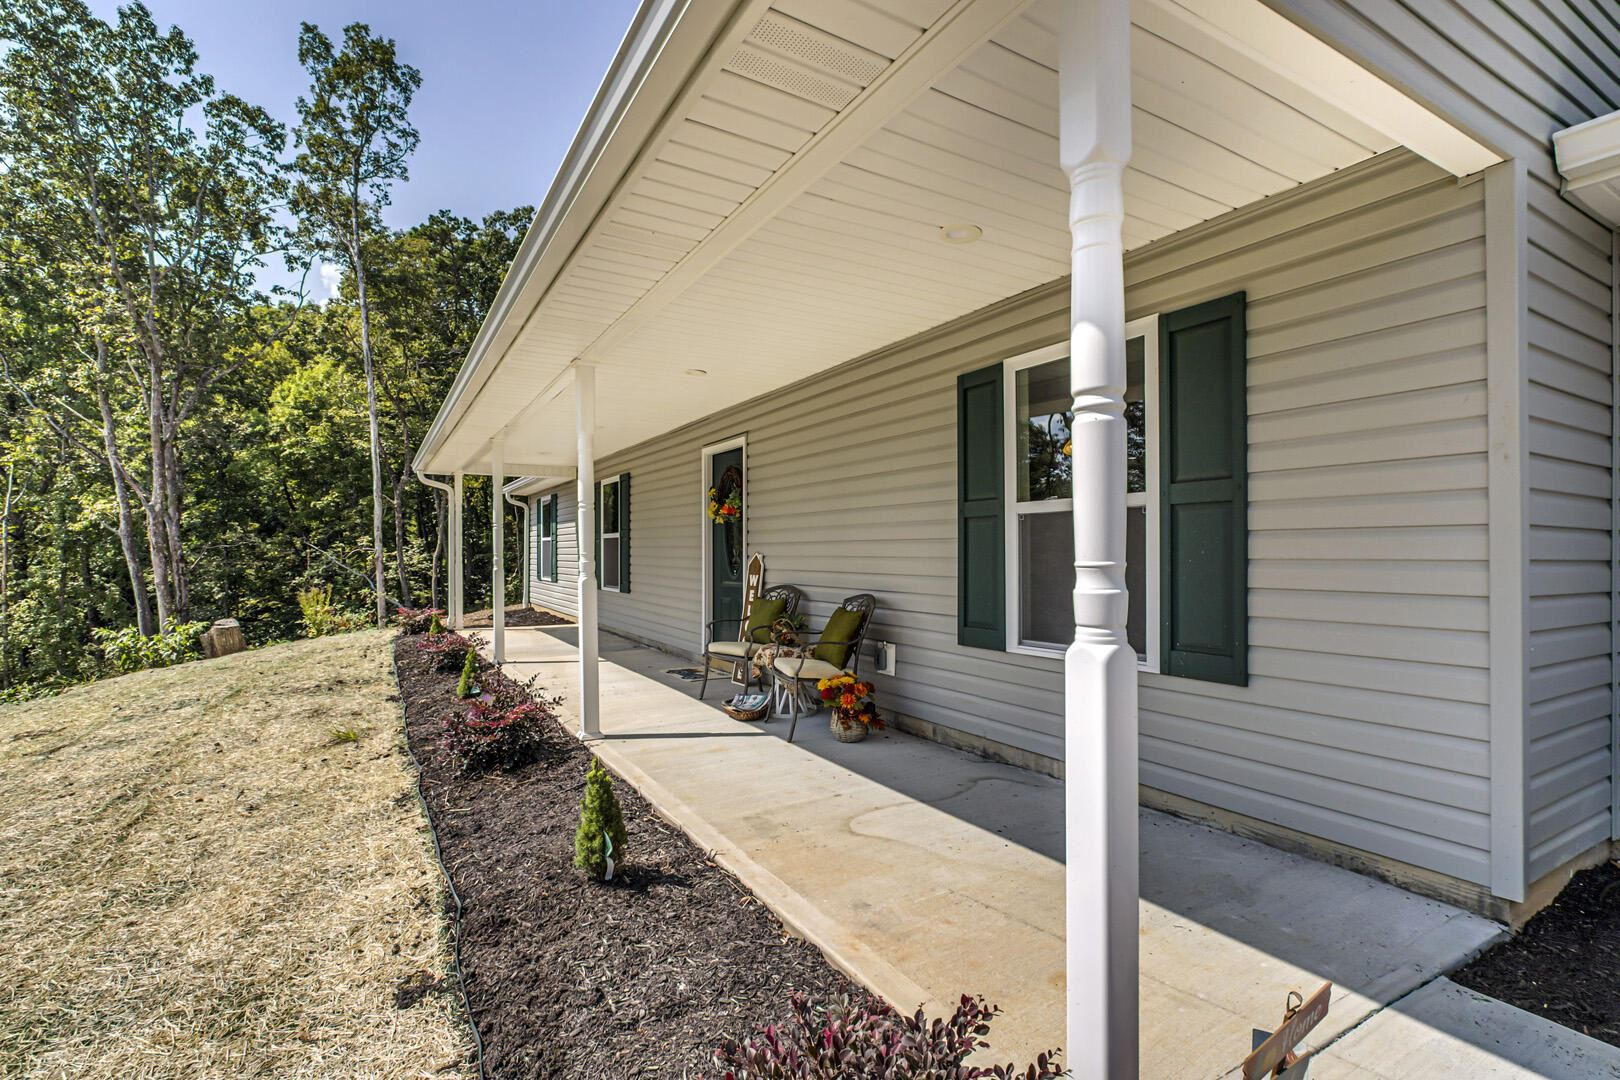 Photo of 142 Gator Lane, Clinton, TN 37716 (MLS # 1167855)